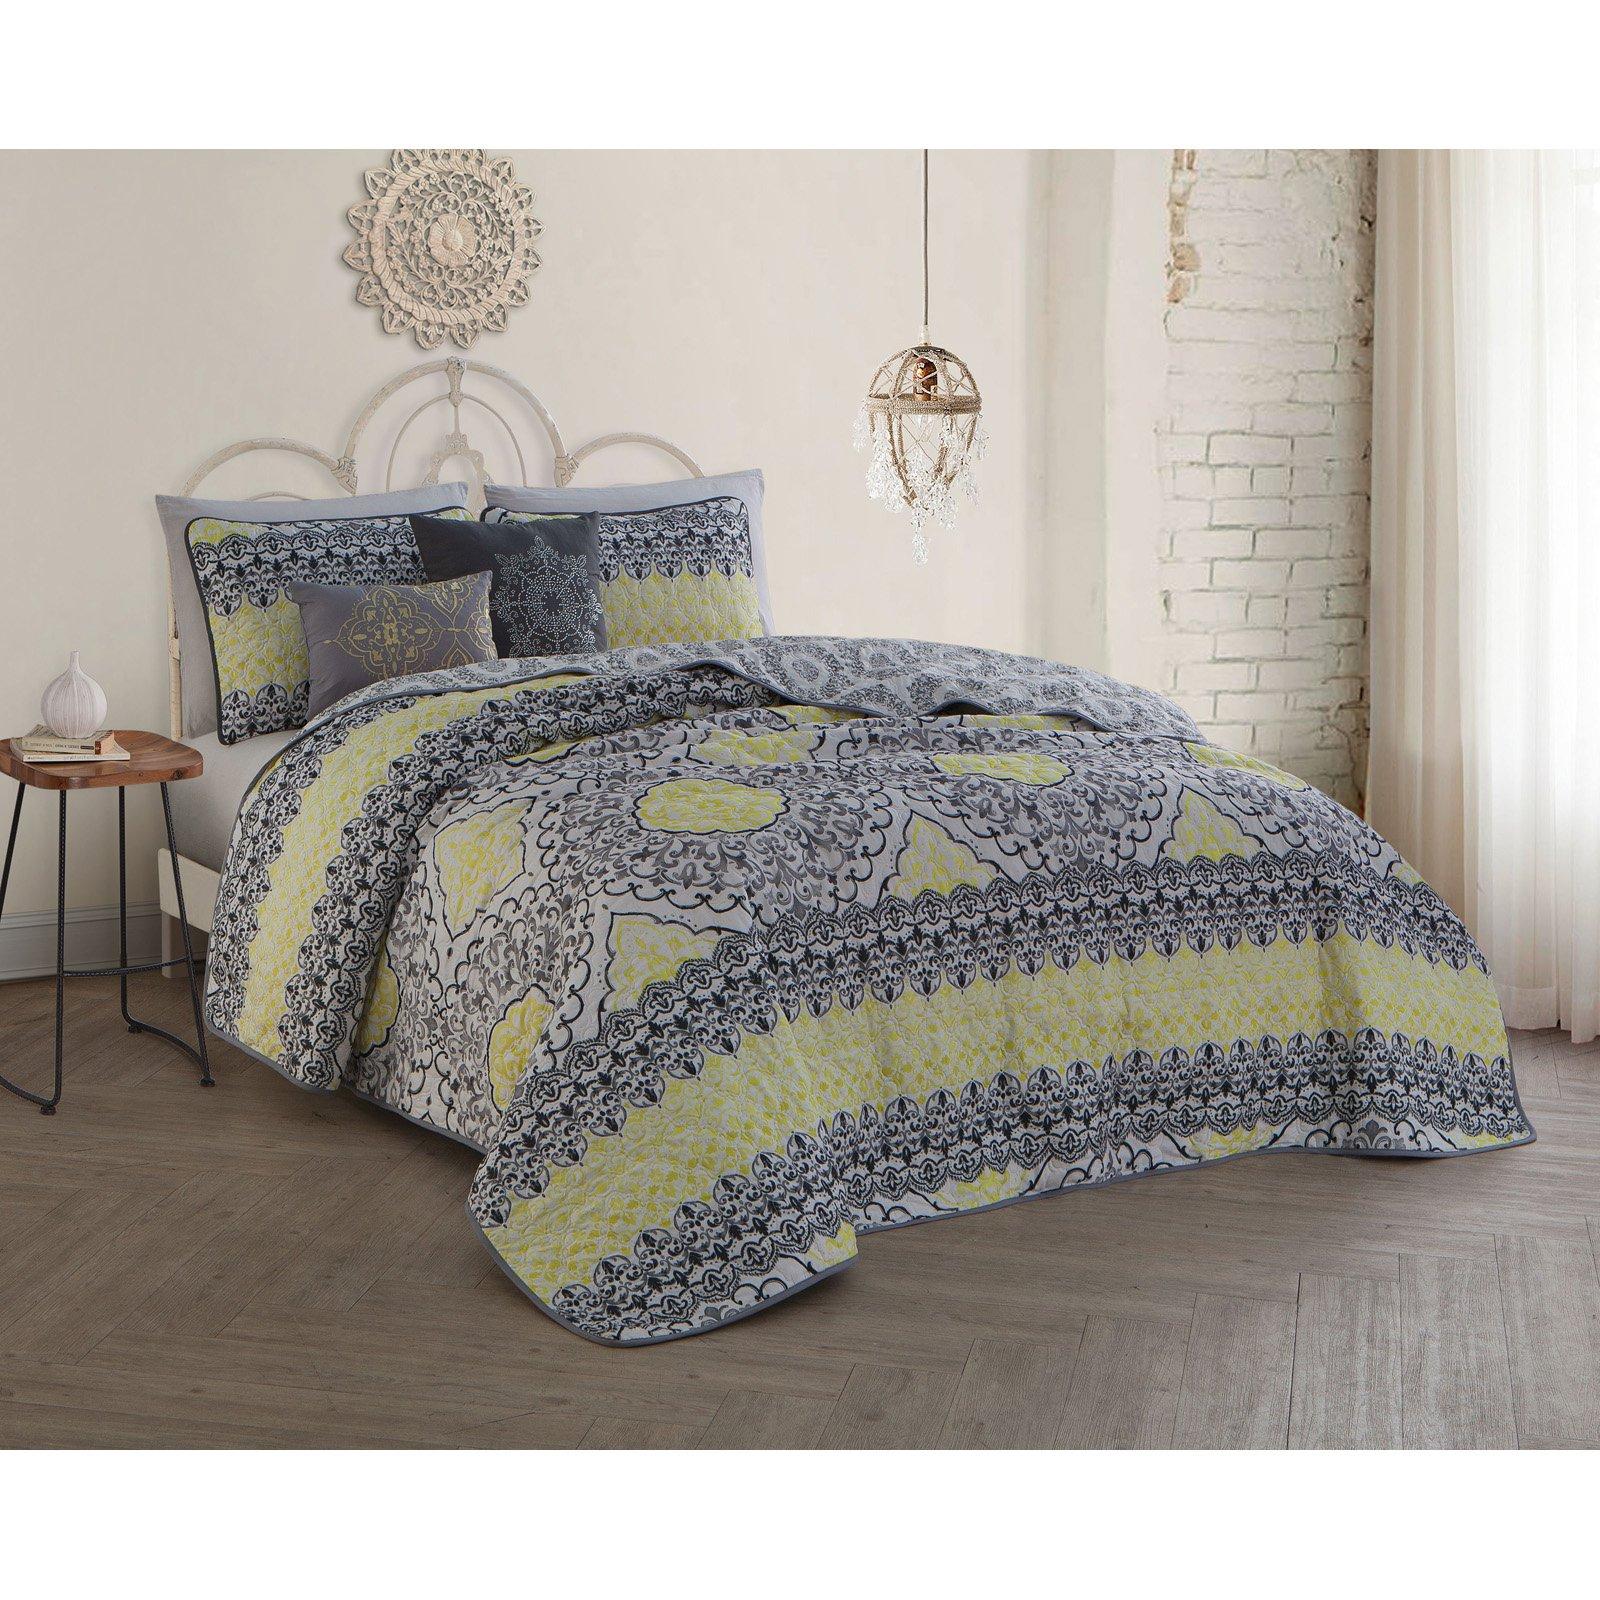 Avondale Manor Celia 5pc Quilt Set - King - Grey/Lime